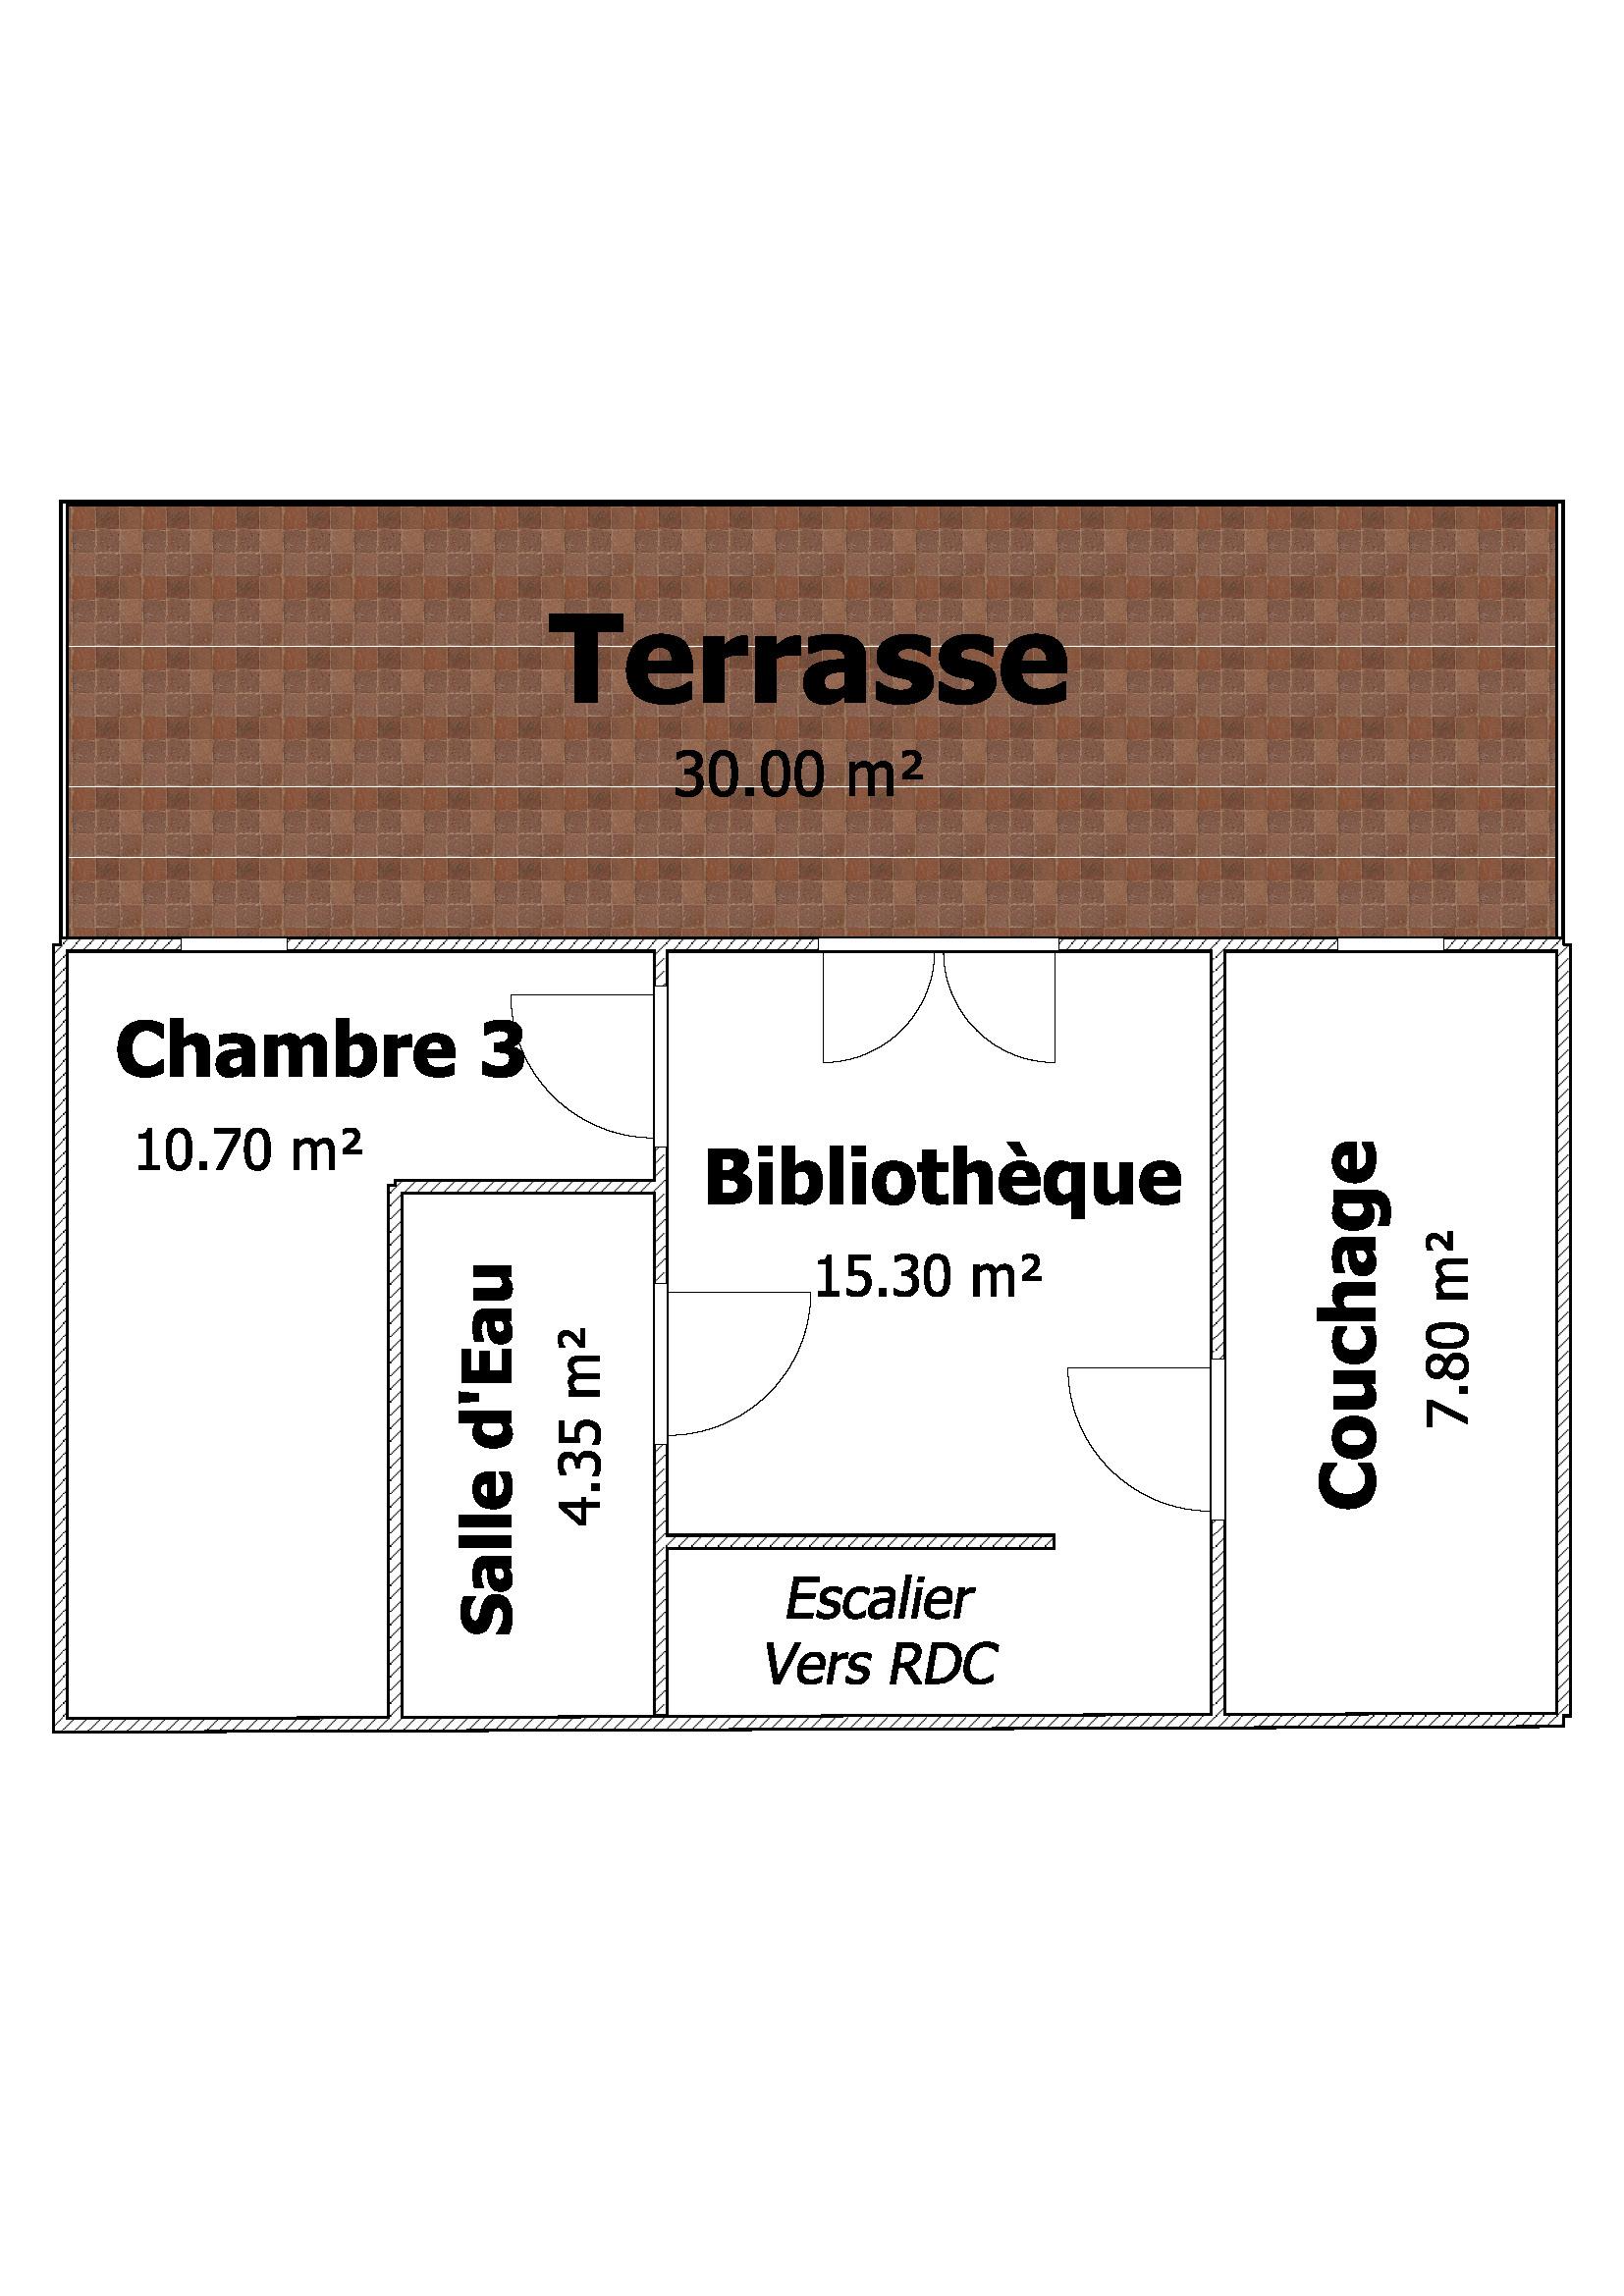 Plan ZOOM Etage 1